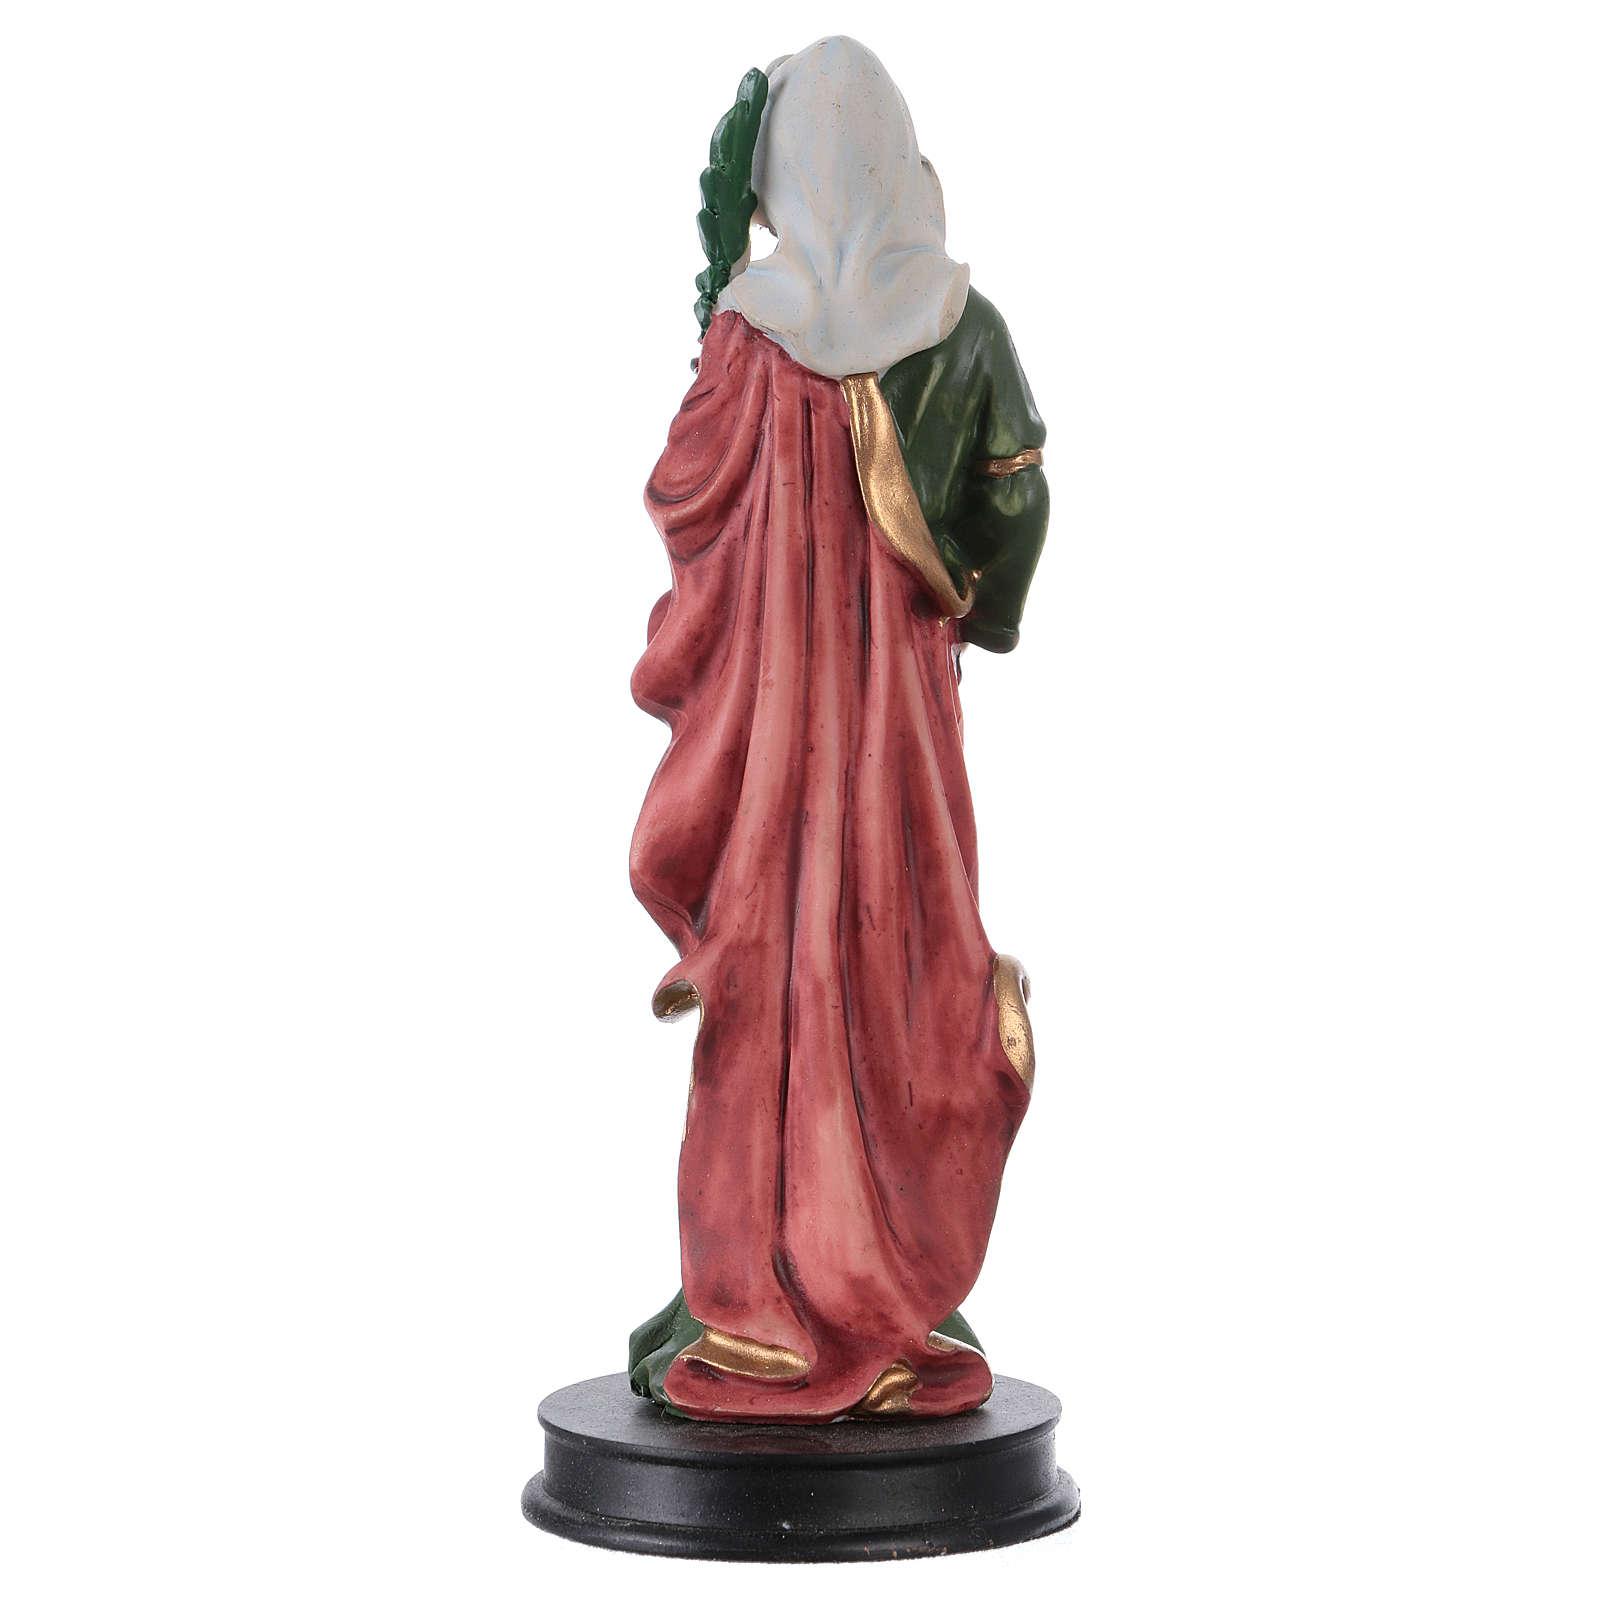 STOCK Heilige Apollonia Statue aus Kunstharz 13 cm 4